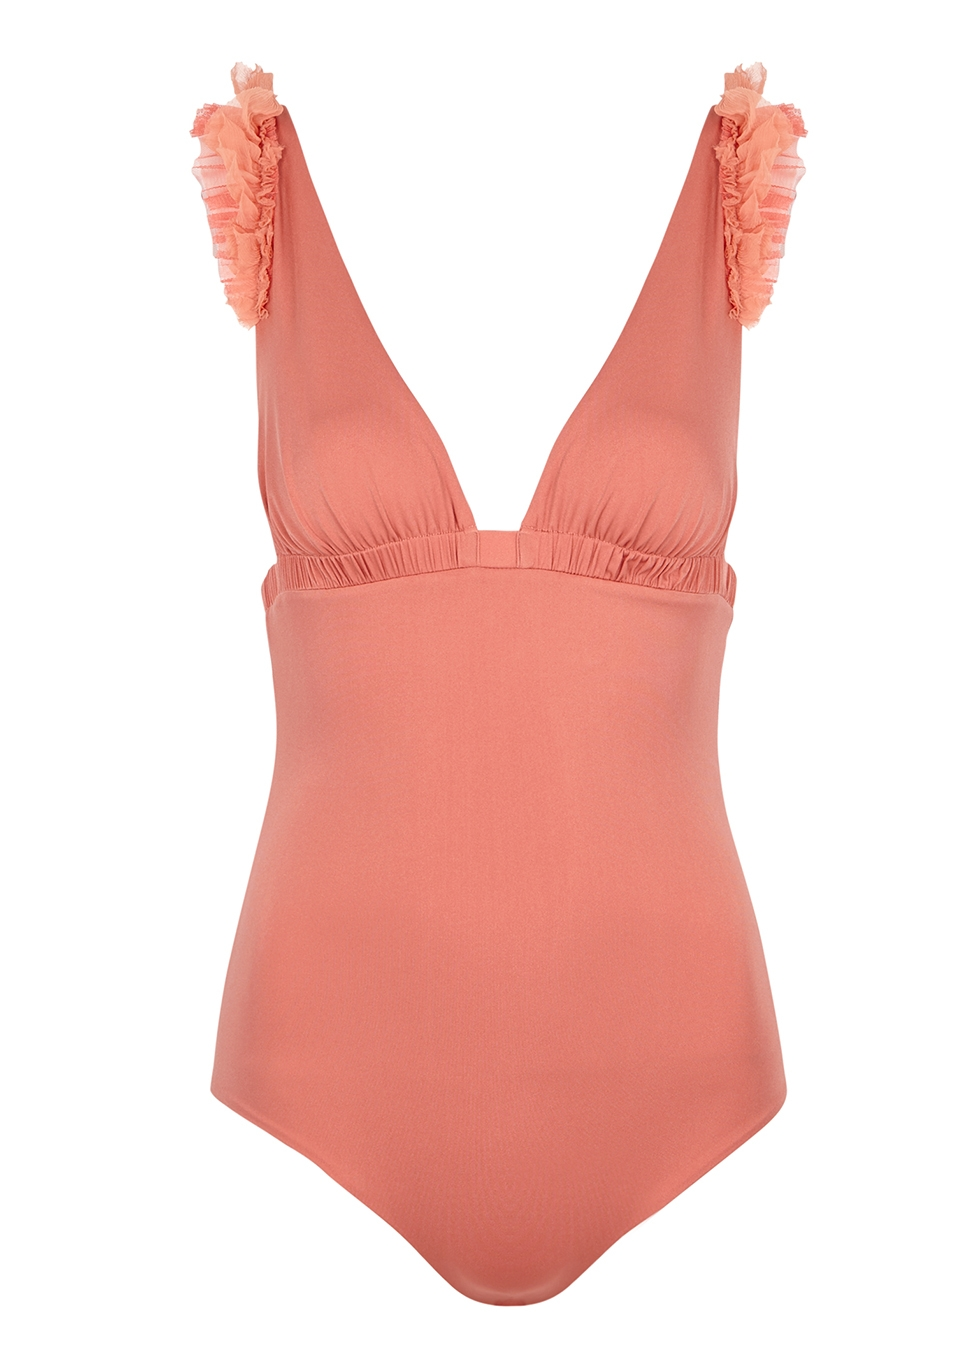 0d986cf63b Women's Designer Swimwear and Beachwear - Harvey Nichols